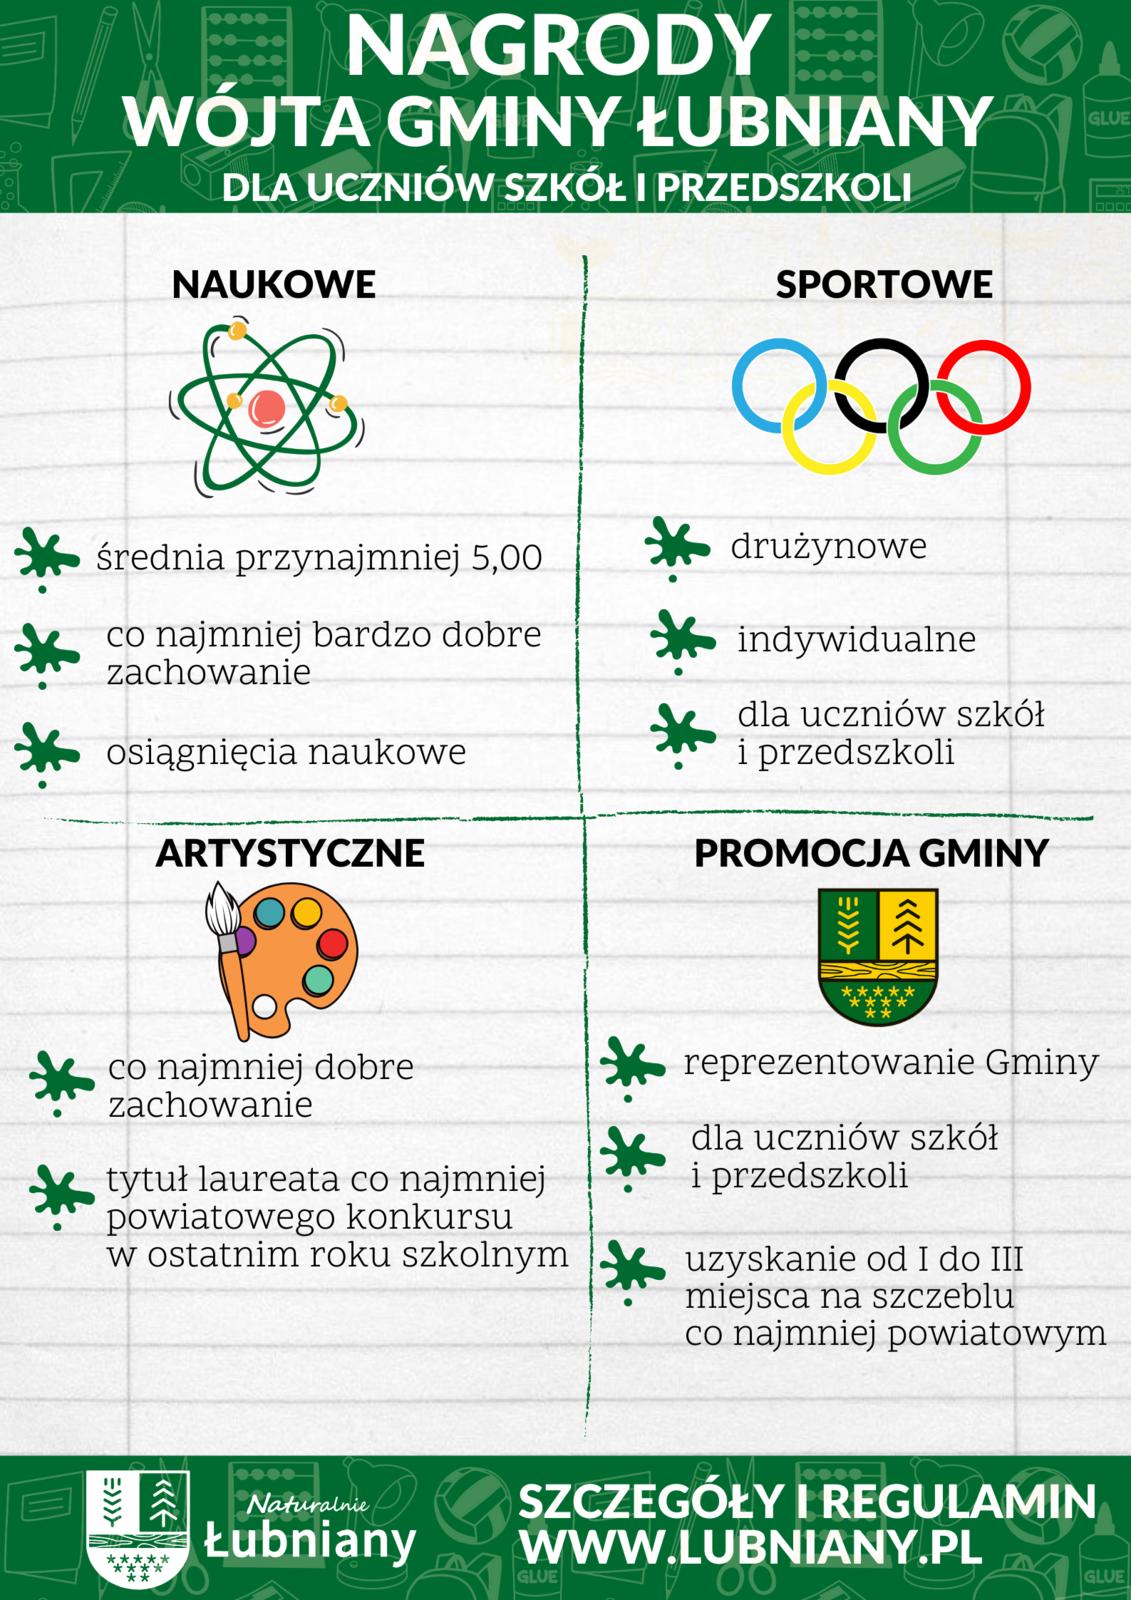 Nagrody Wójta Gminy Łubniany - dobry.png